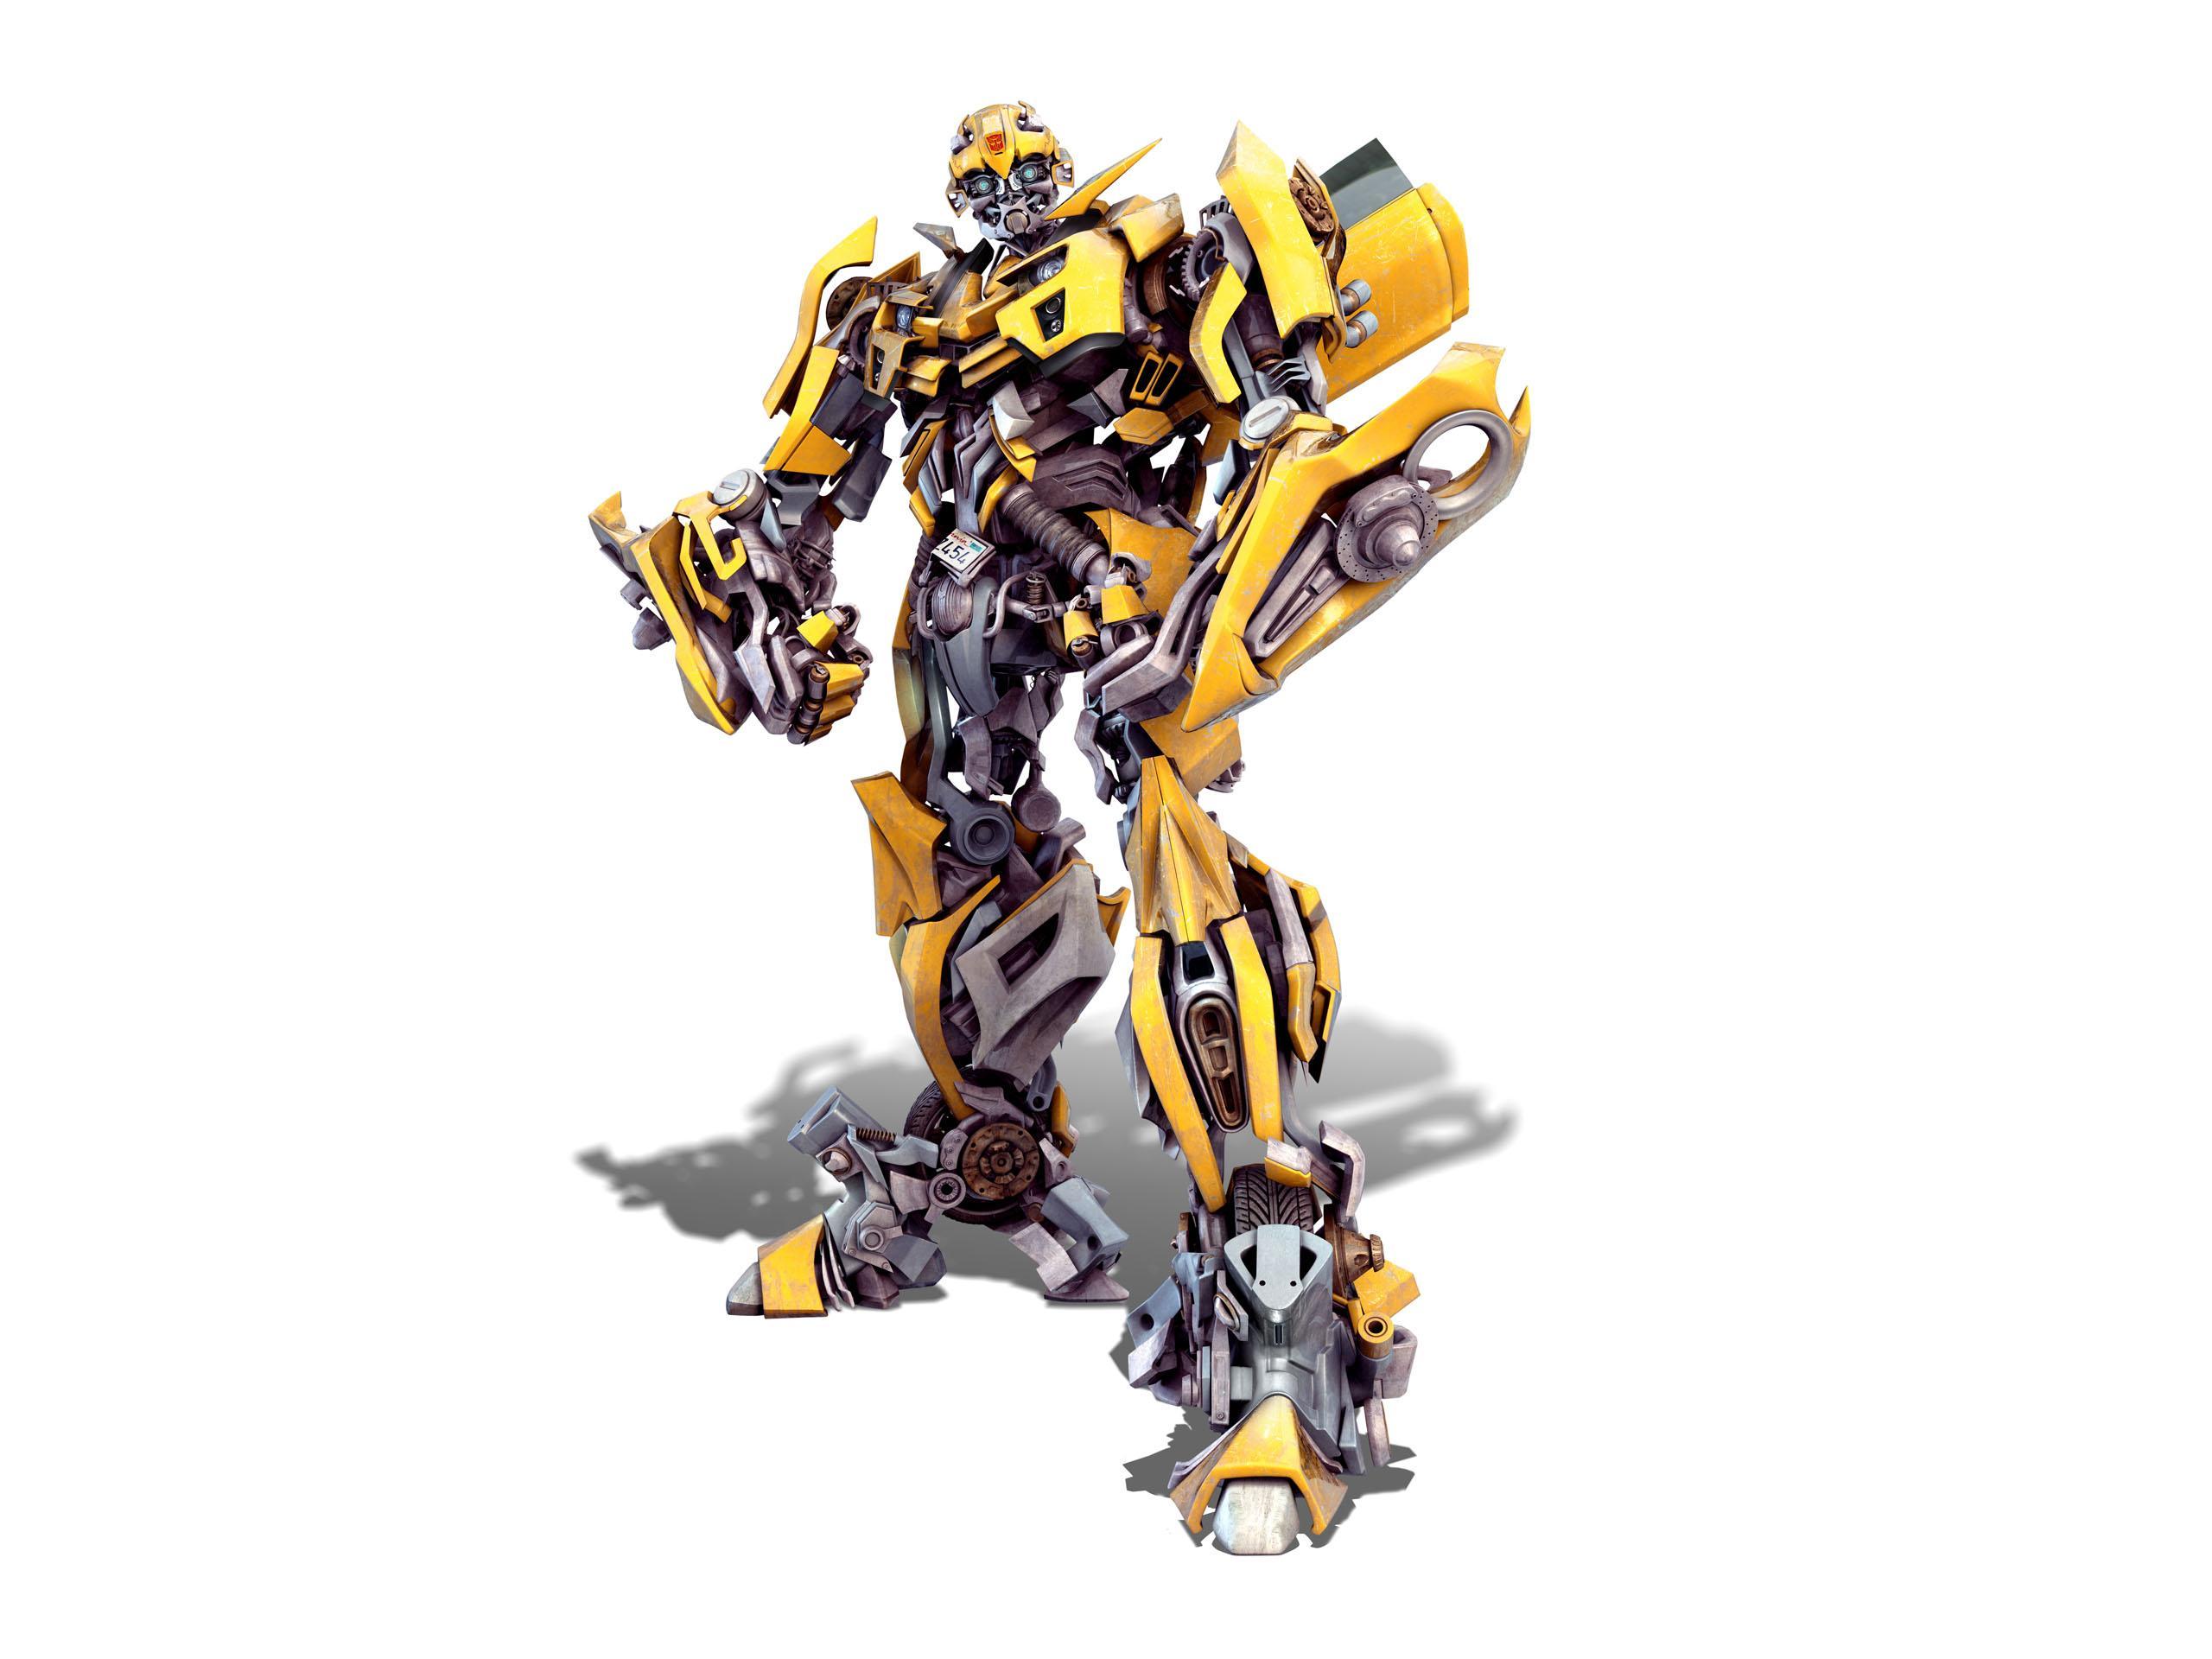 Download Cool Bumblebee Transformer Wallpaper Full HD Wallpapers 2560x1920